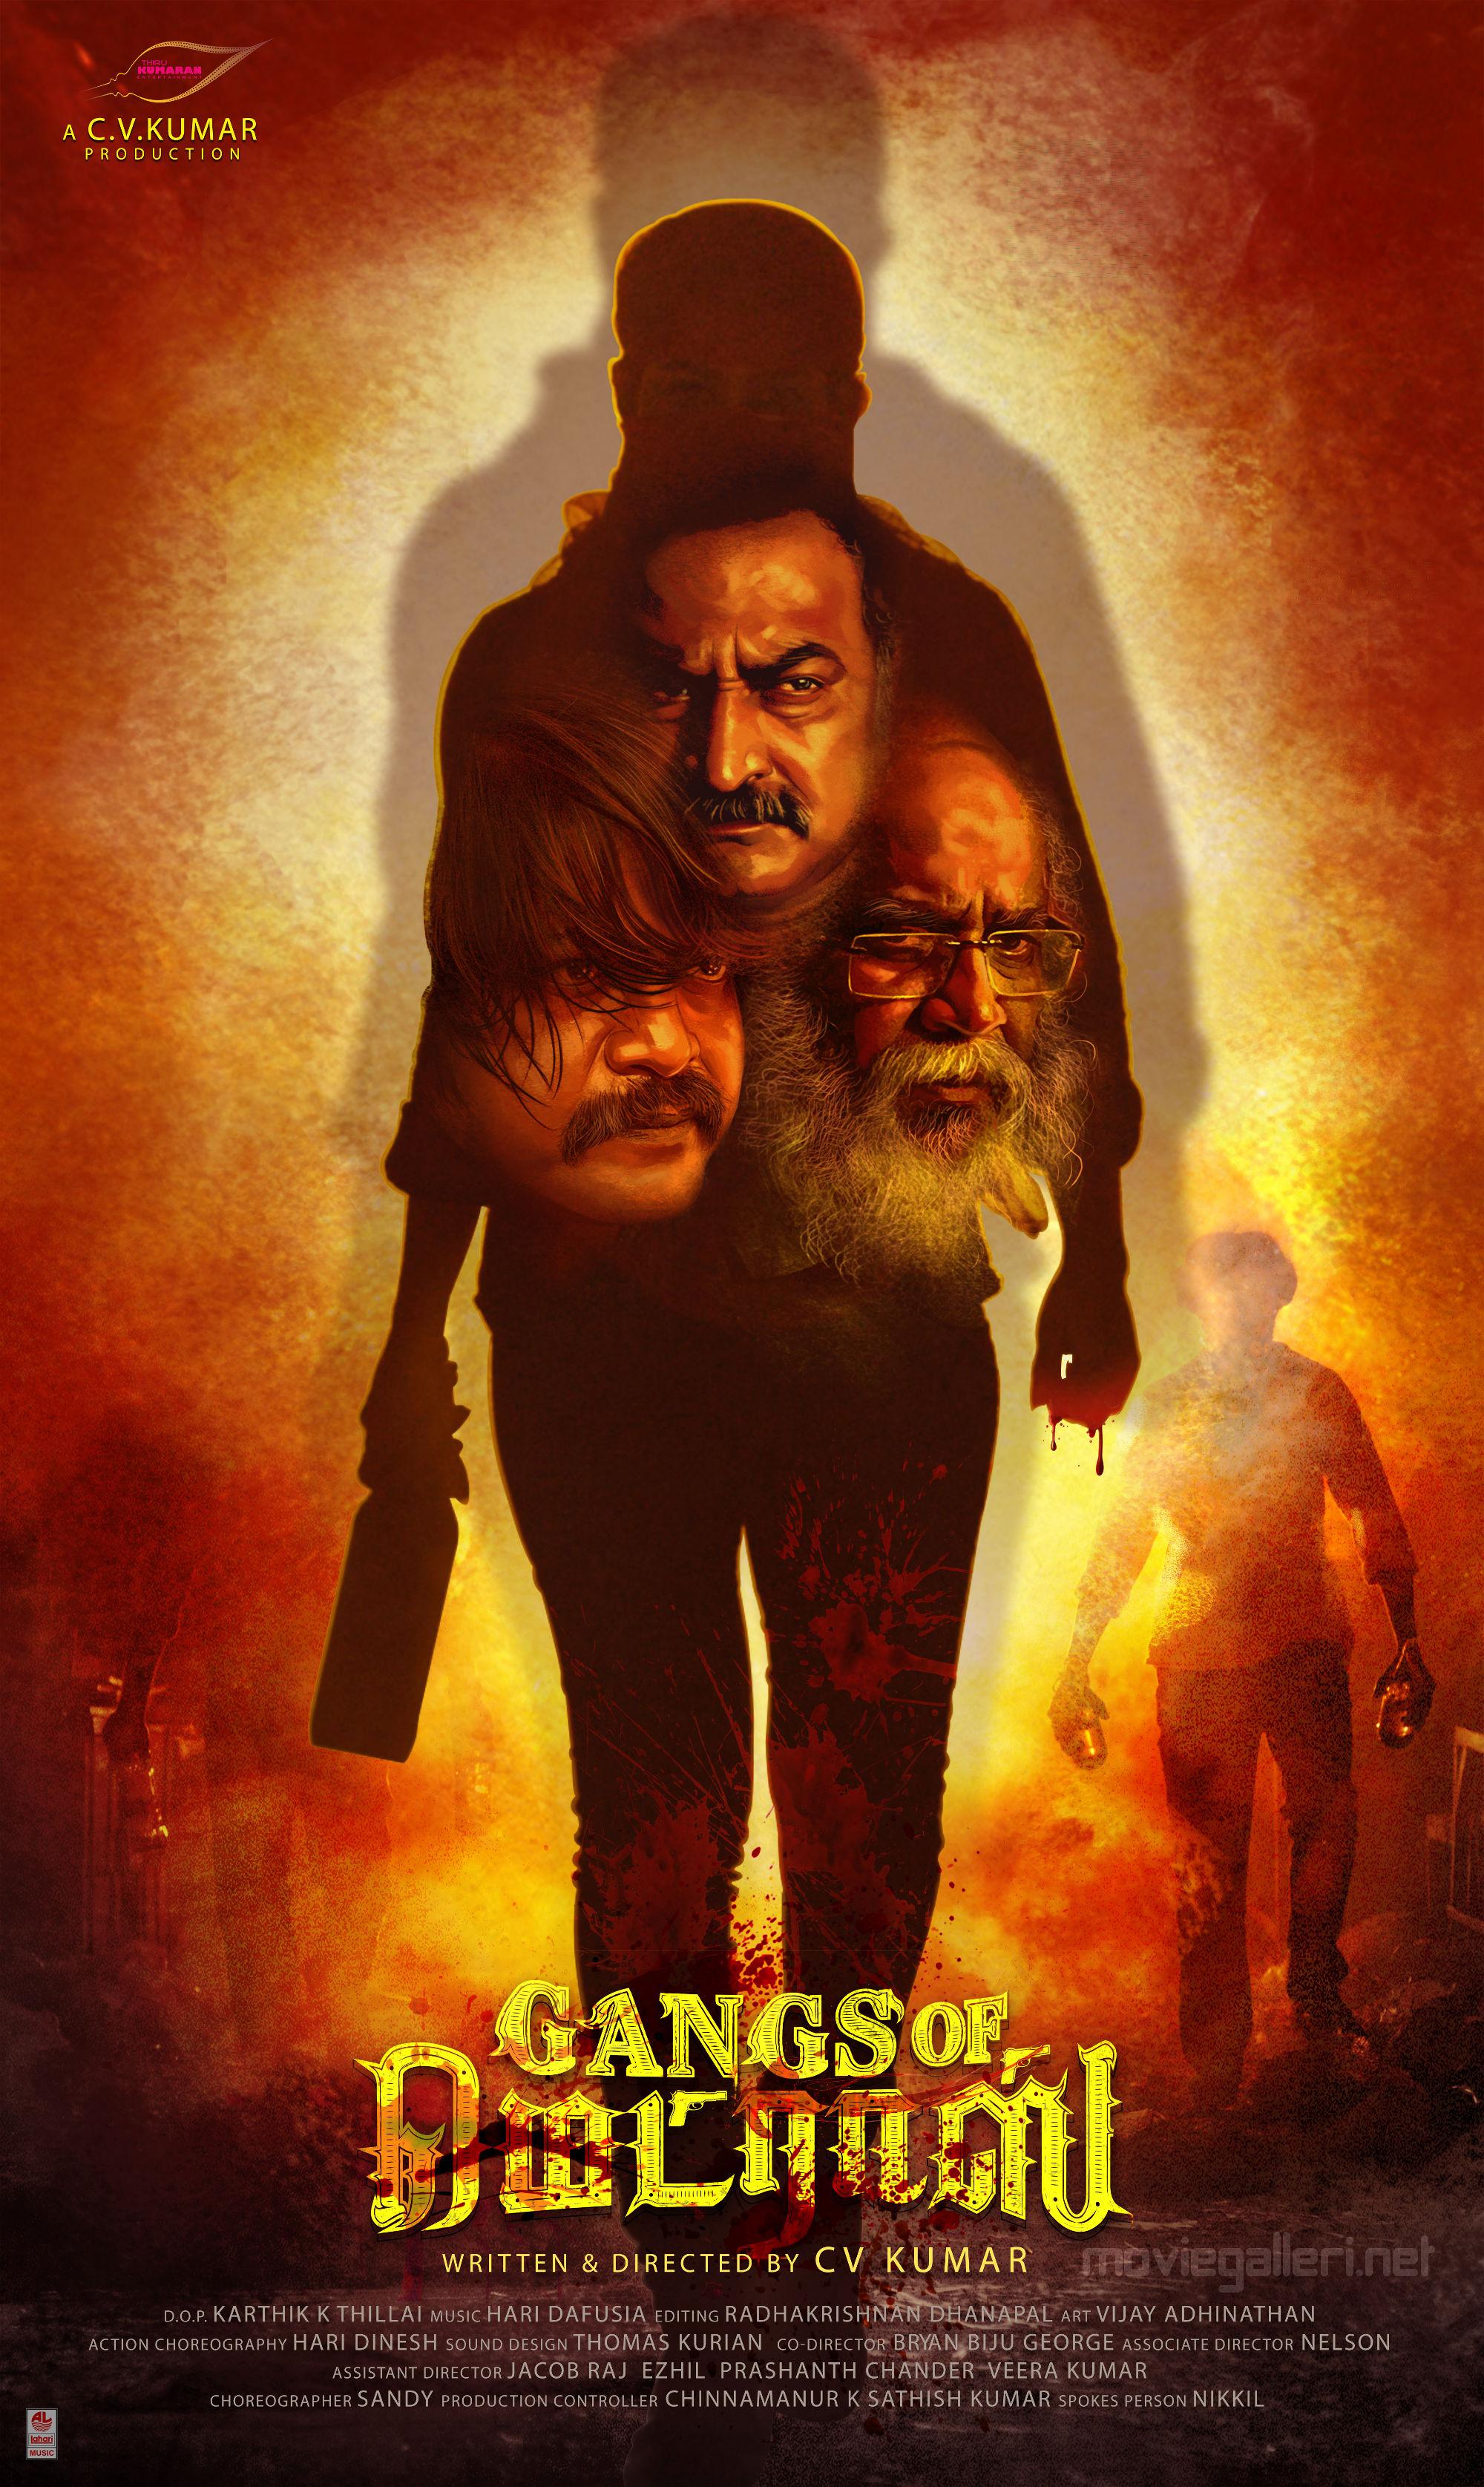 Daniel Balaji Naren GM Kumar Gangs of Madras First Look Poster HD